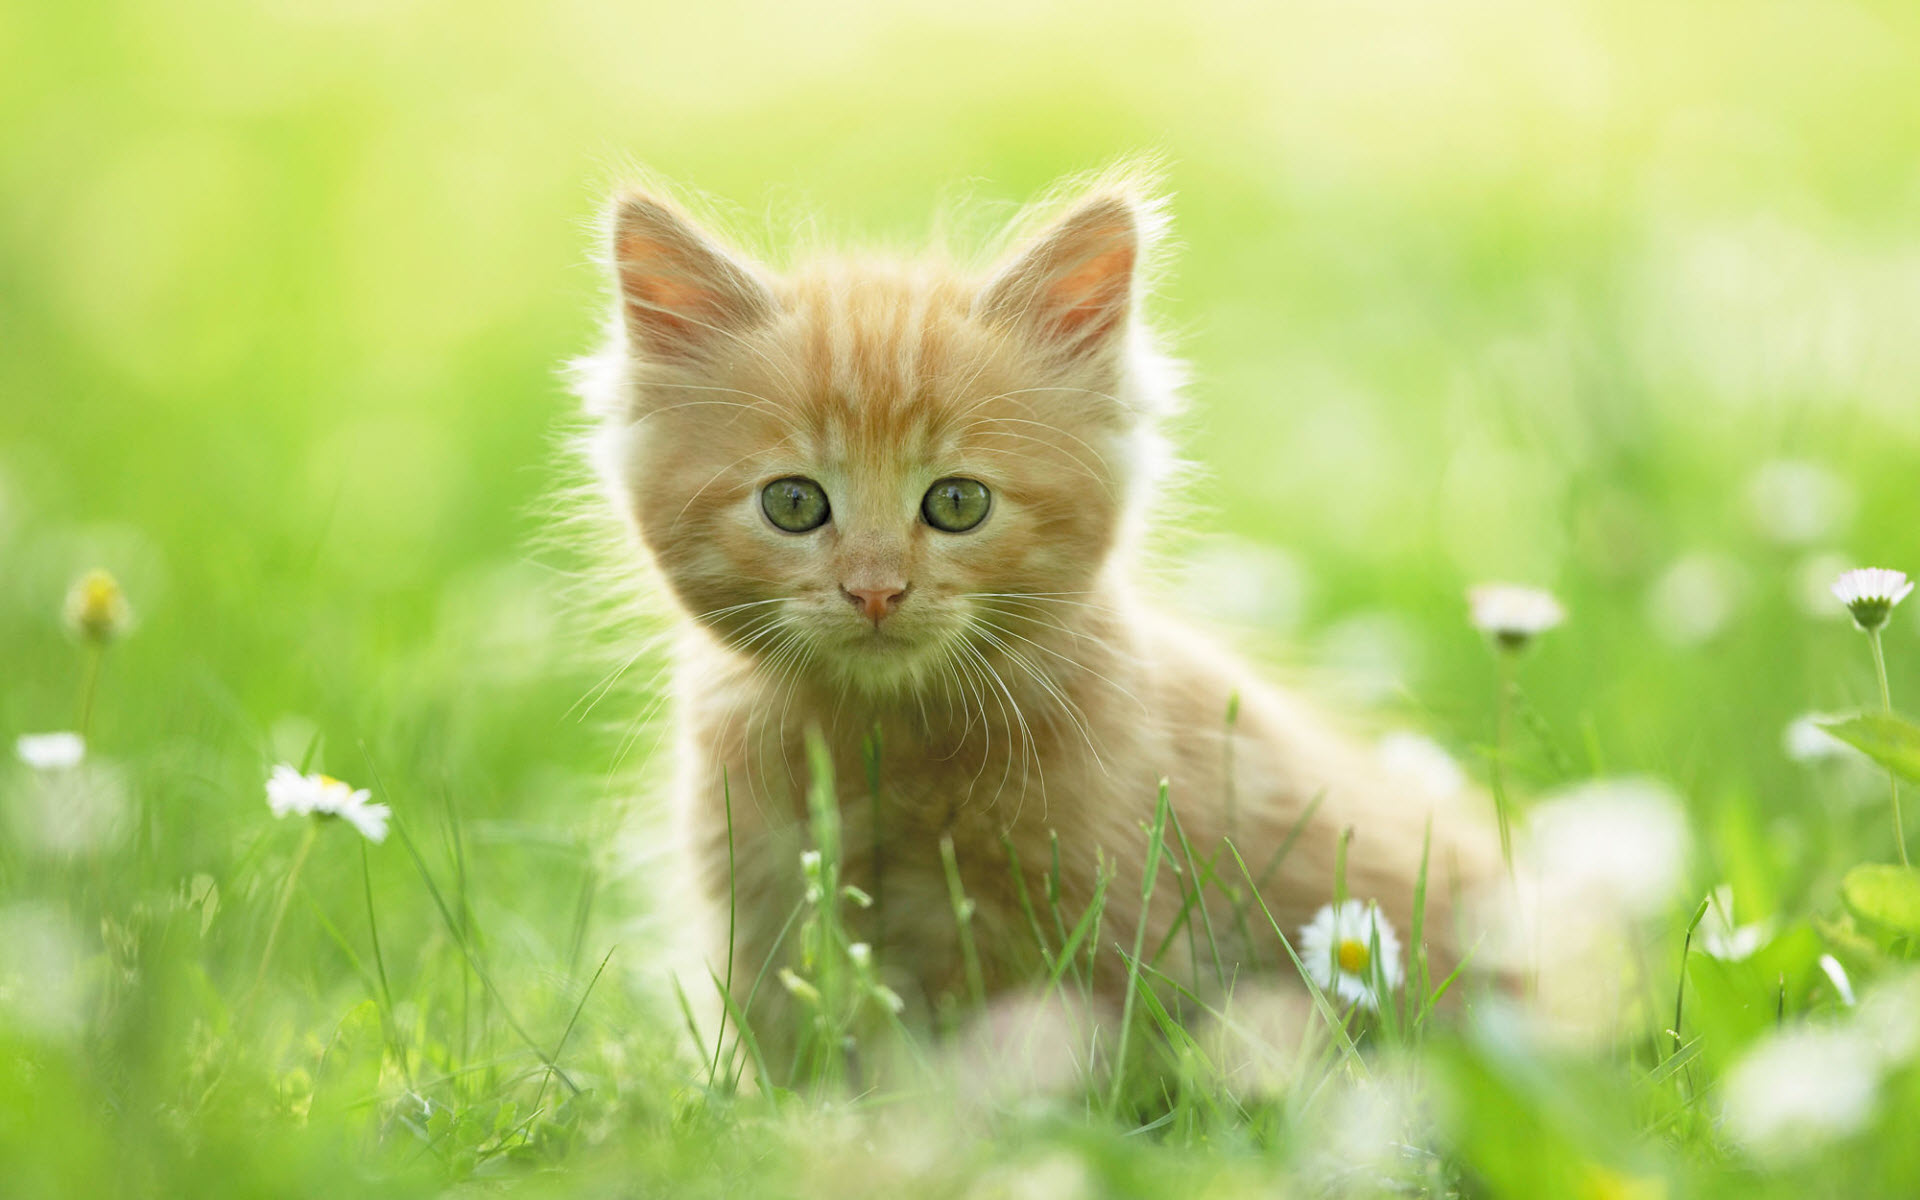 Curious Cute Kittens HD Wallpapers   Design Hey Design Hey 1920x1200